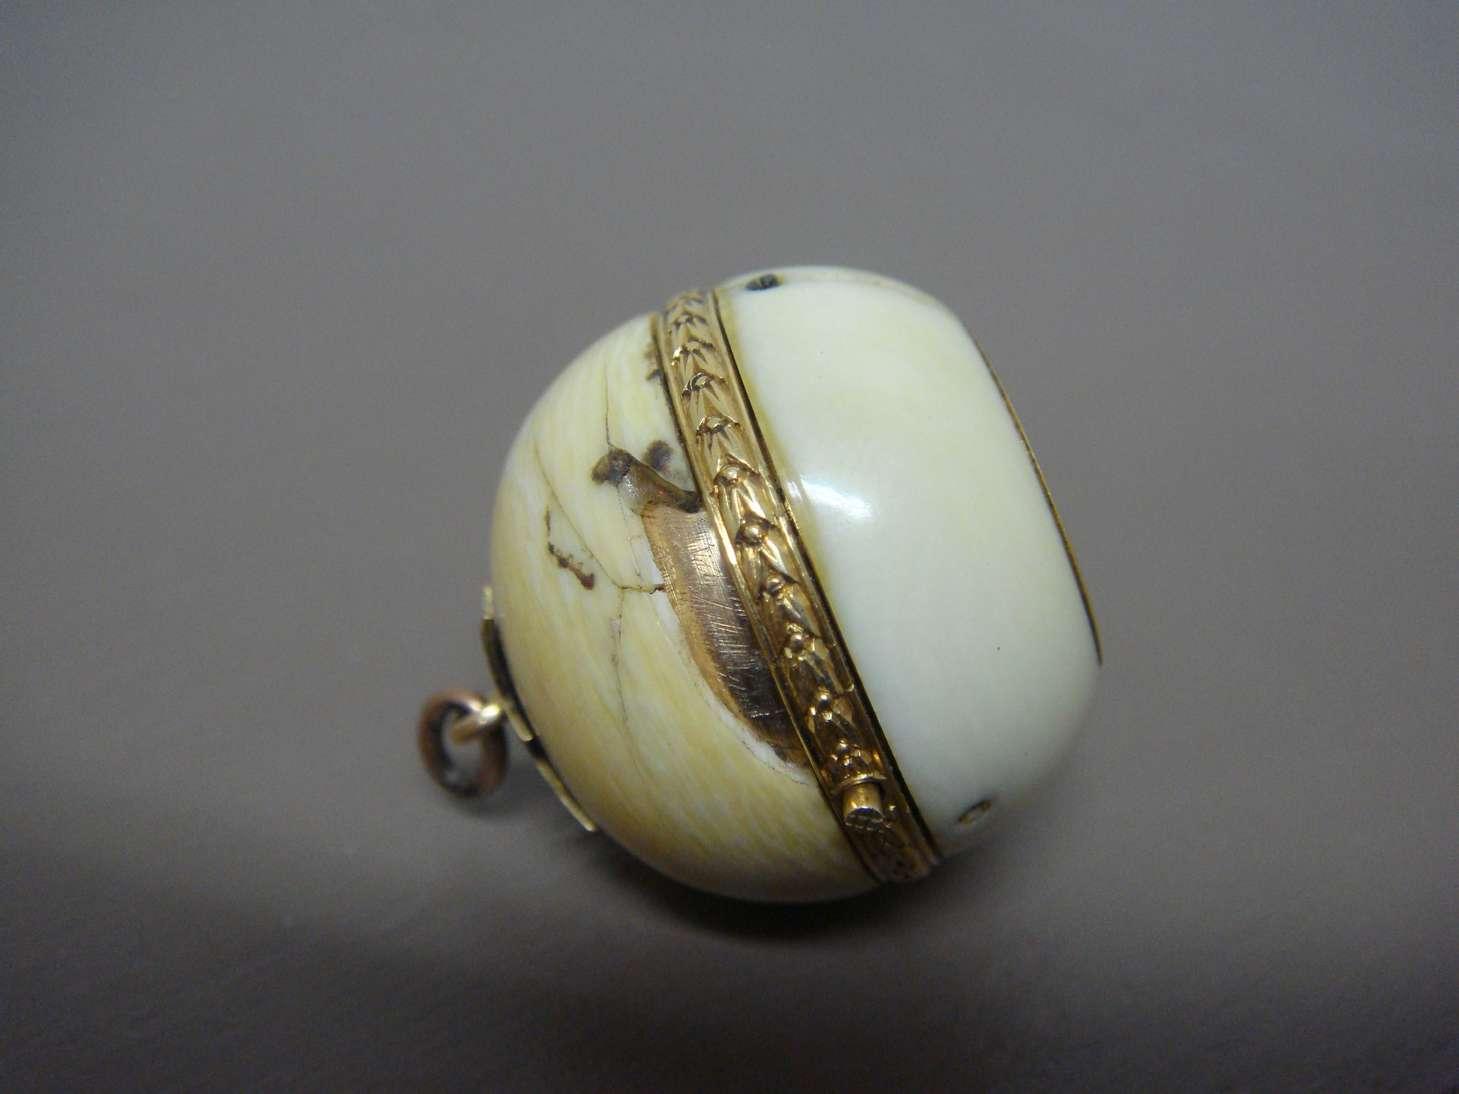 boule-geneve-montre-luxe-ivoire-reparation-horlogerie-cabinotier-art-restauration-restaurarte.jpg